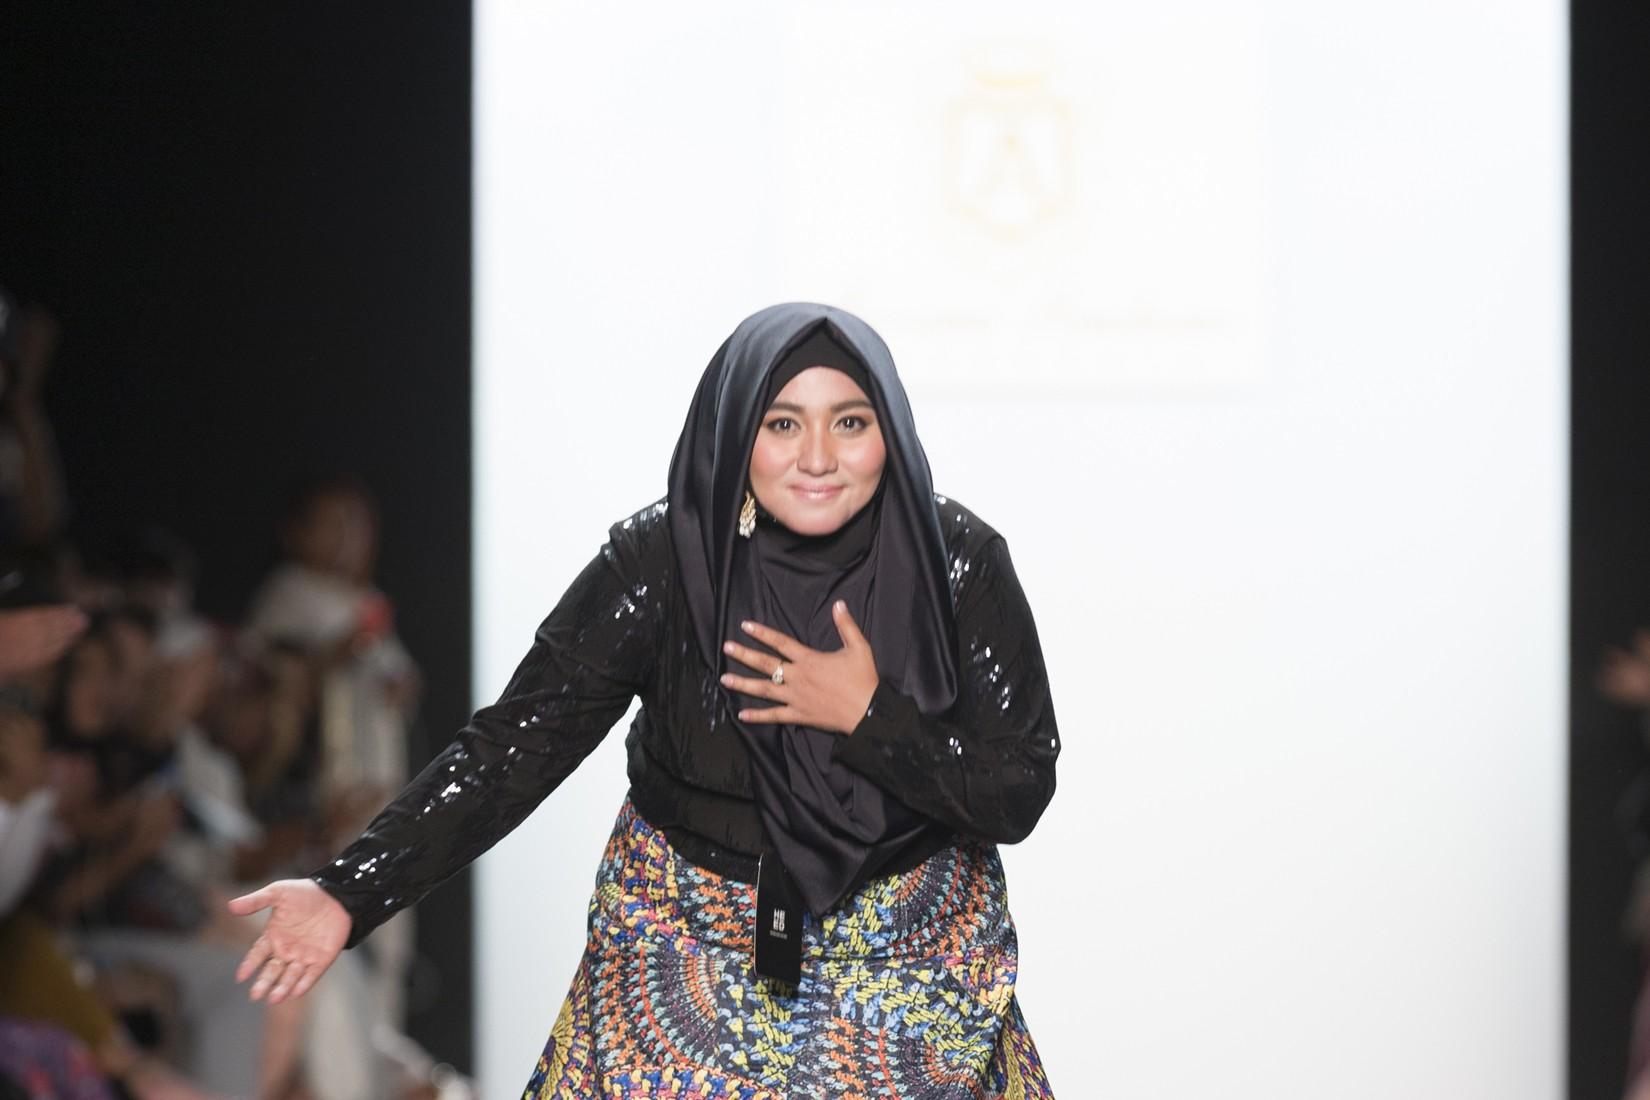 Muslim Fashion Is A 254 Billion MarketBut Big Brands Can Indonesian muslim fashion designers